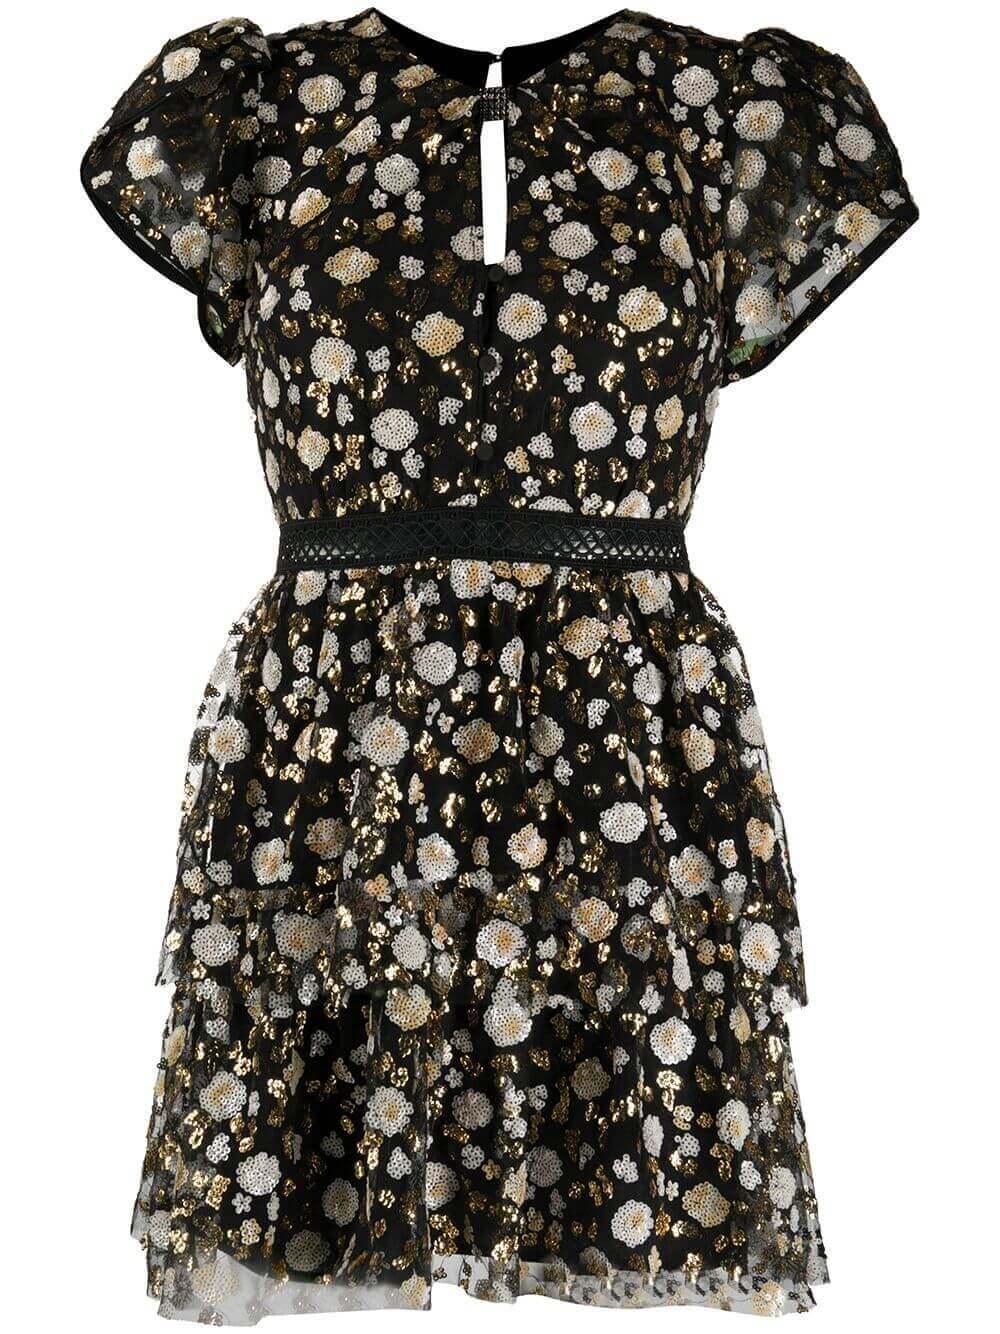 Sequin Mesh Floral Mini Dress Item # AW20-028S